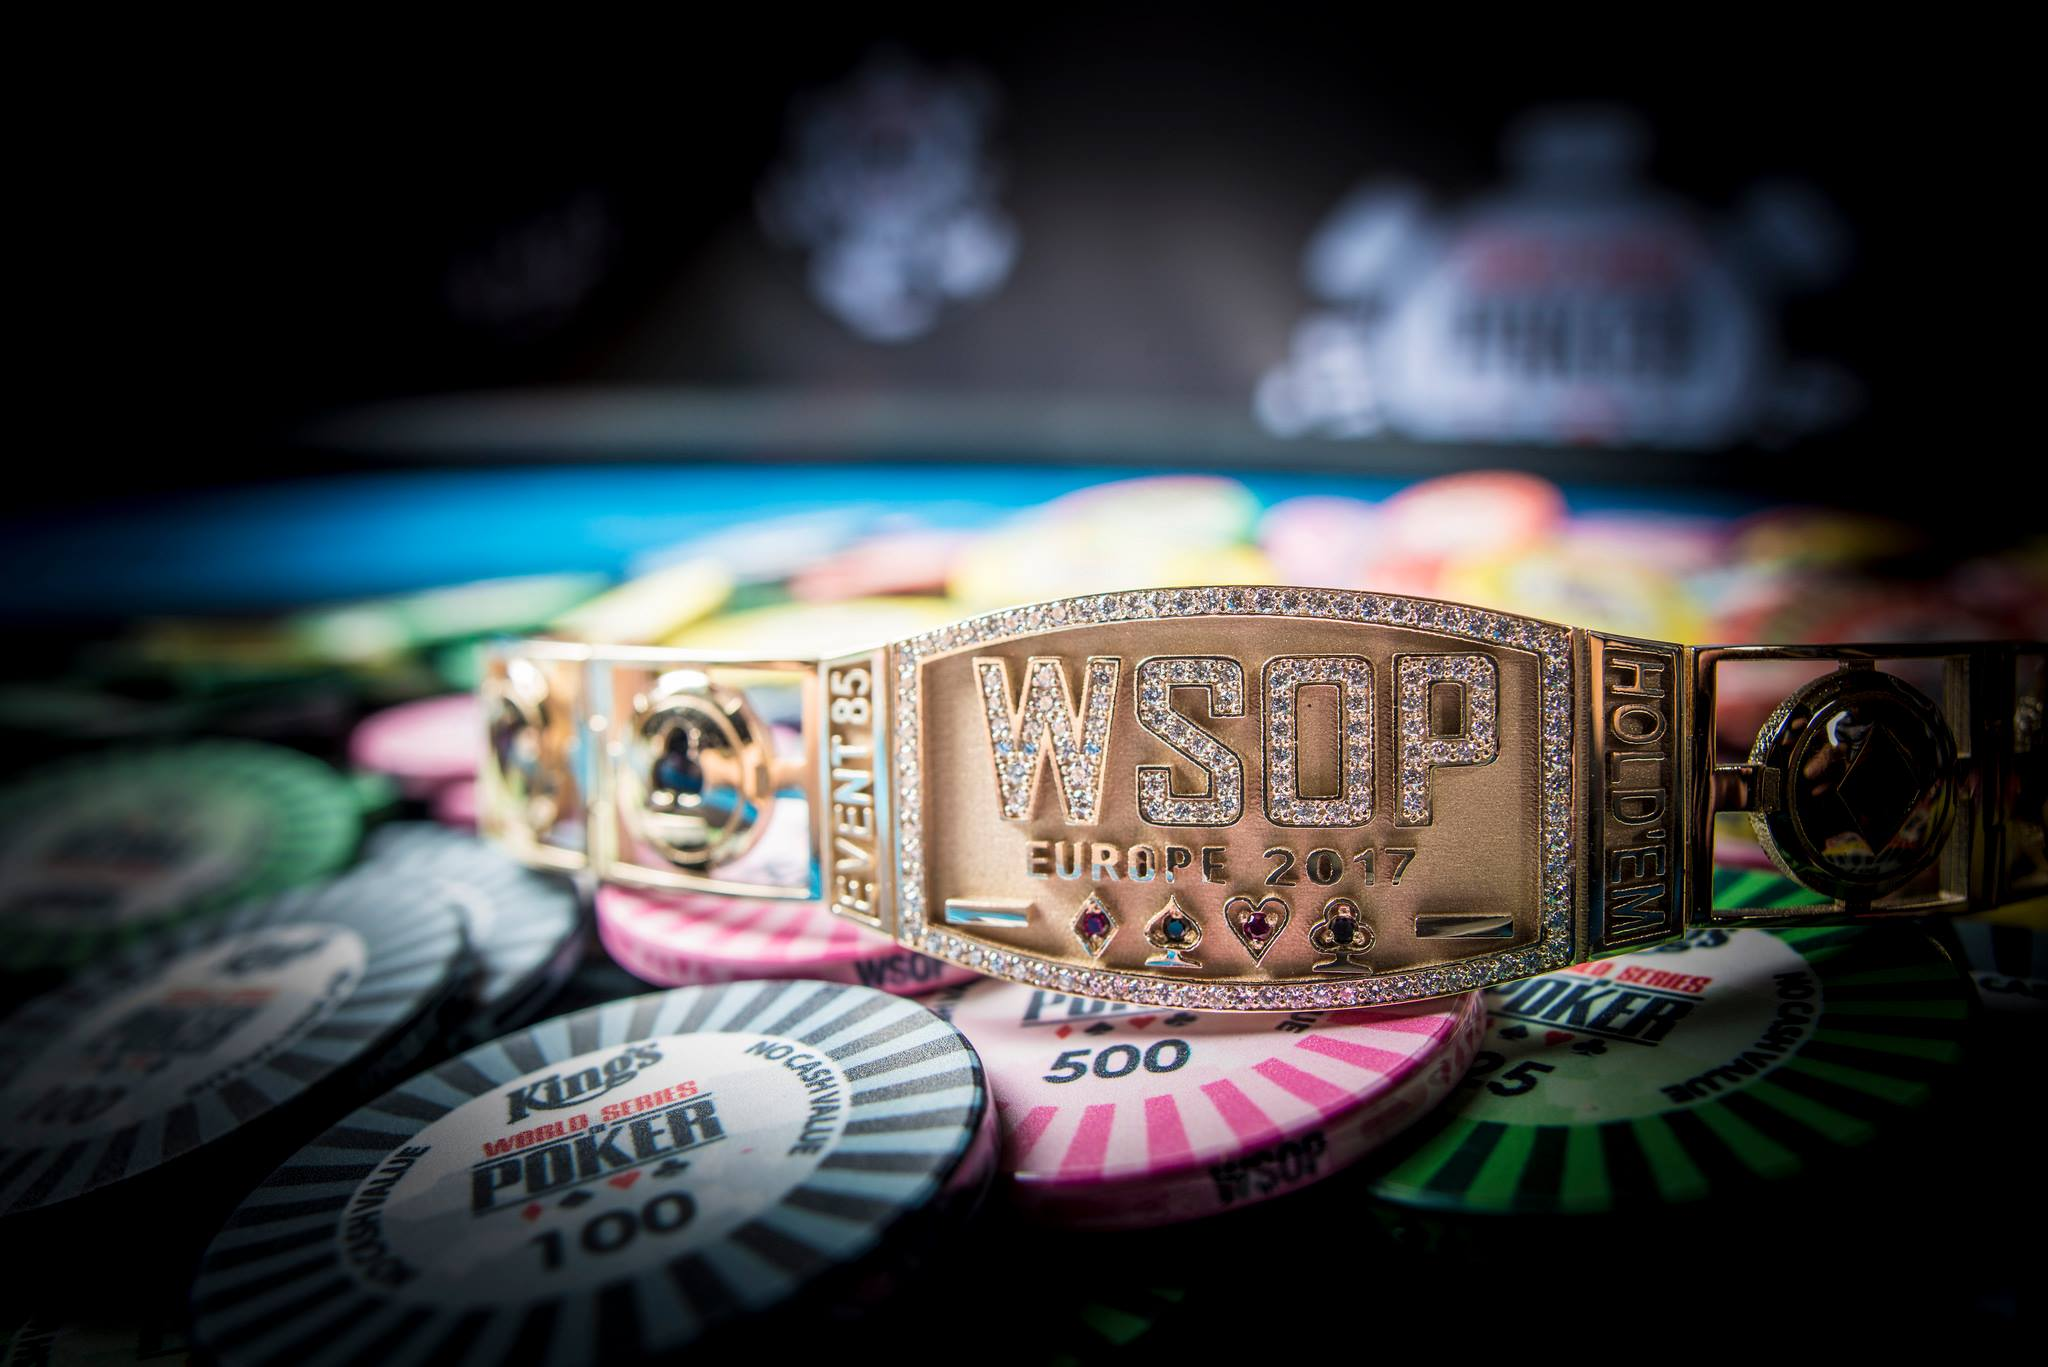 WSOPE_MainEvent_Bracelet